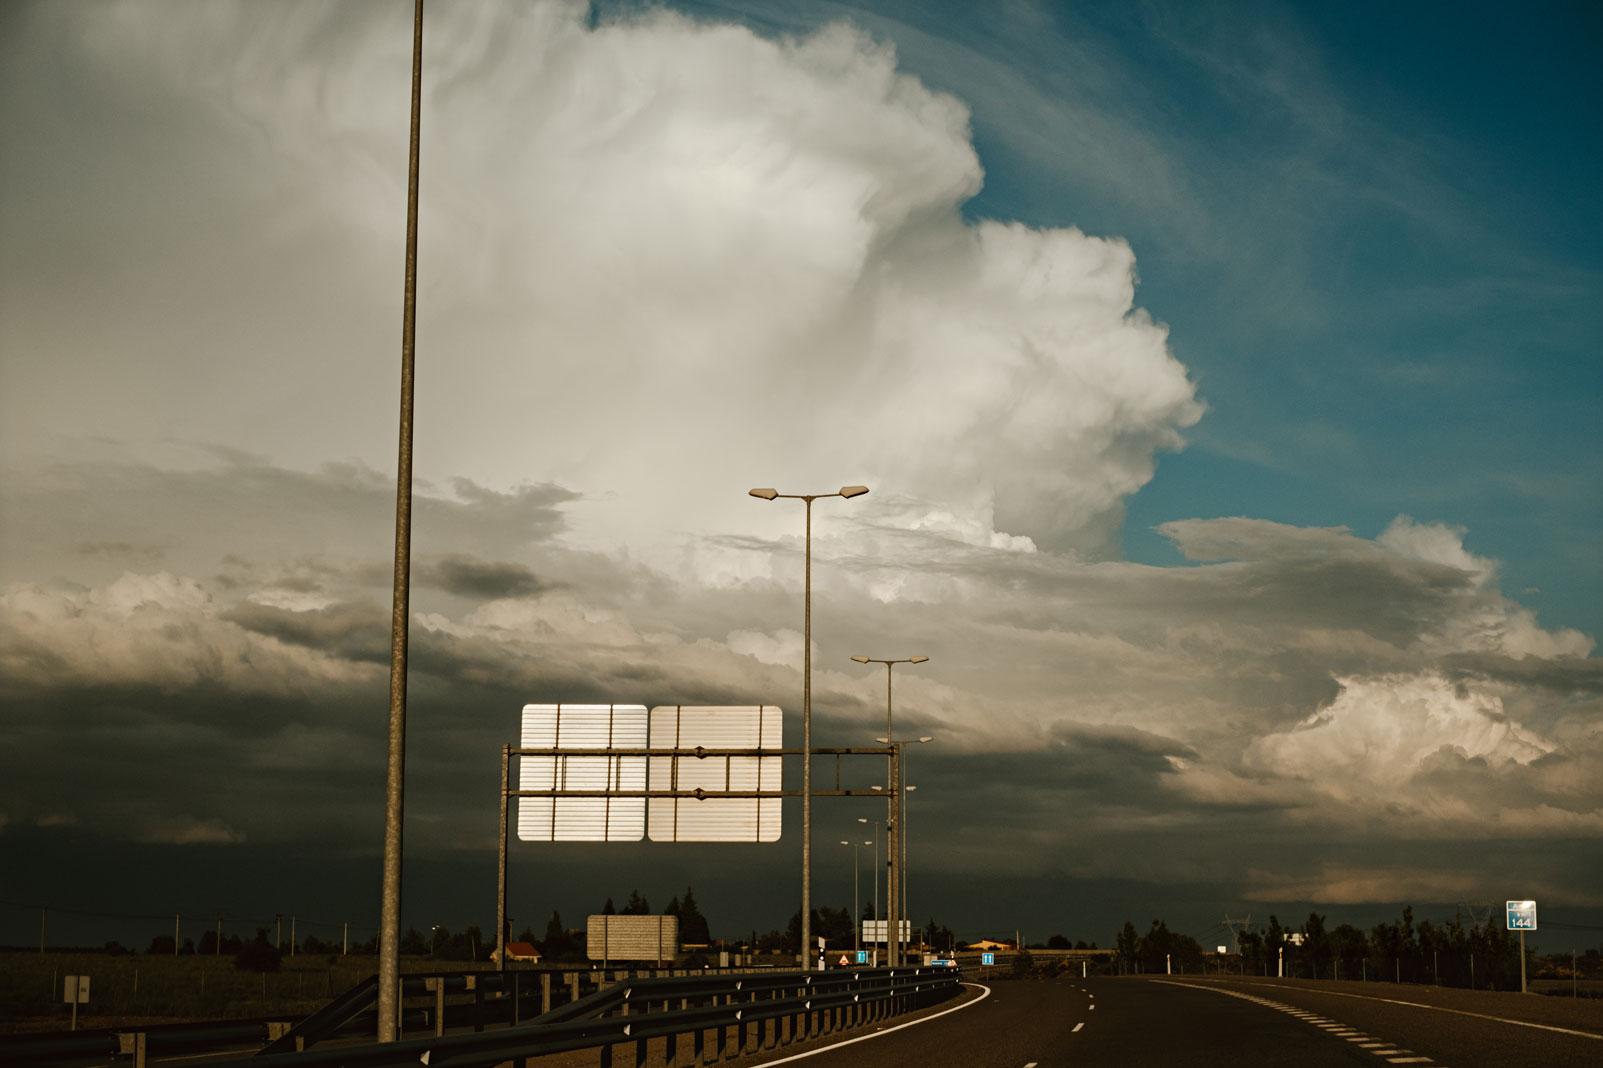 Fotos en la carretera